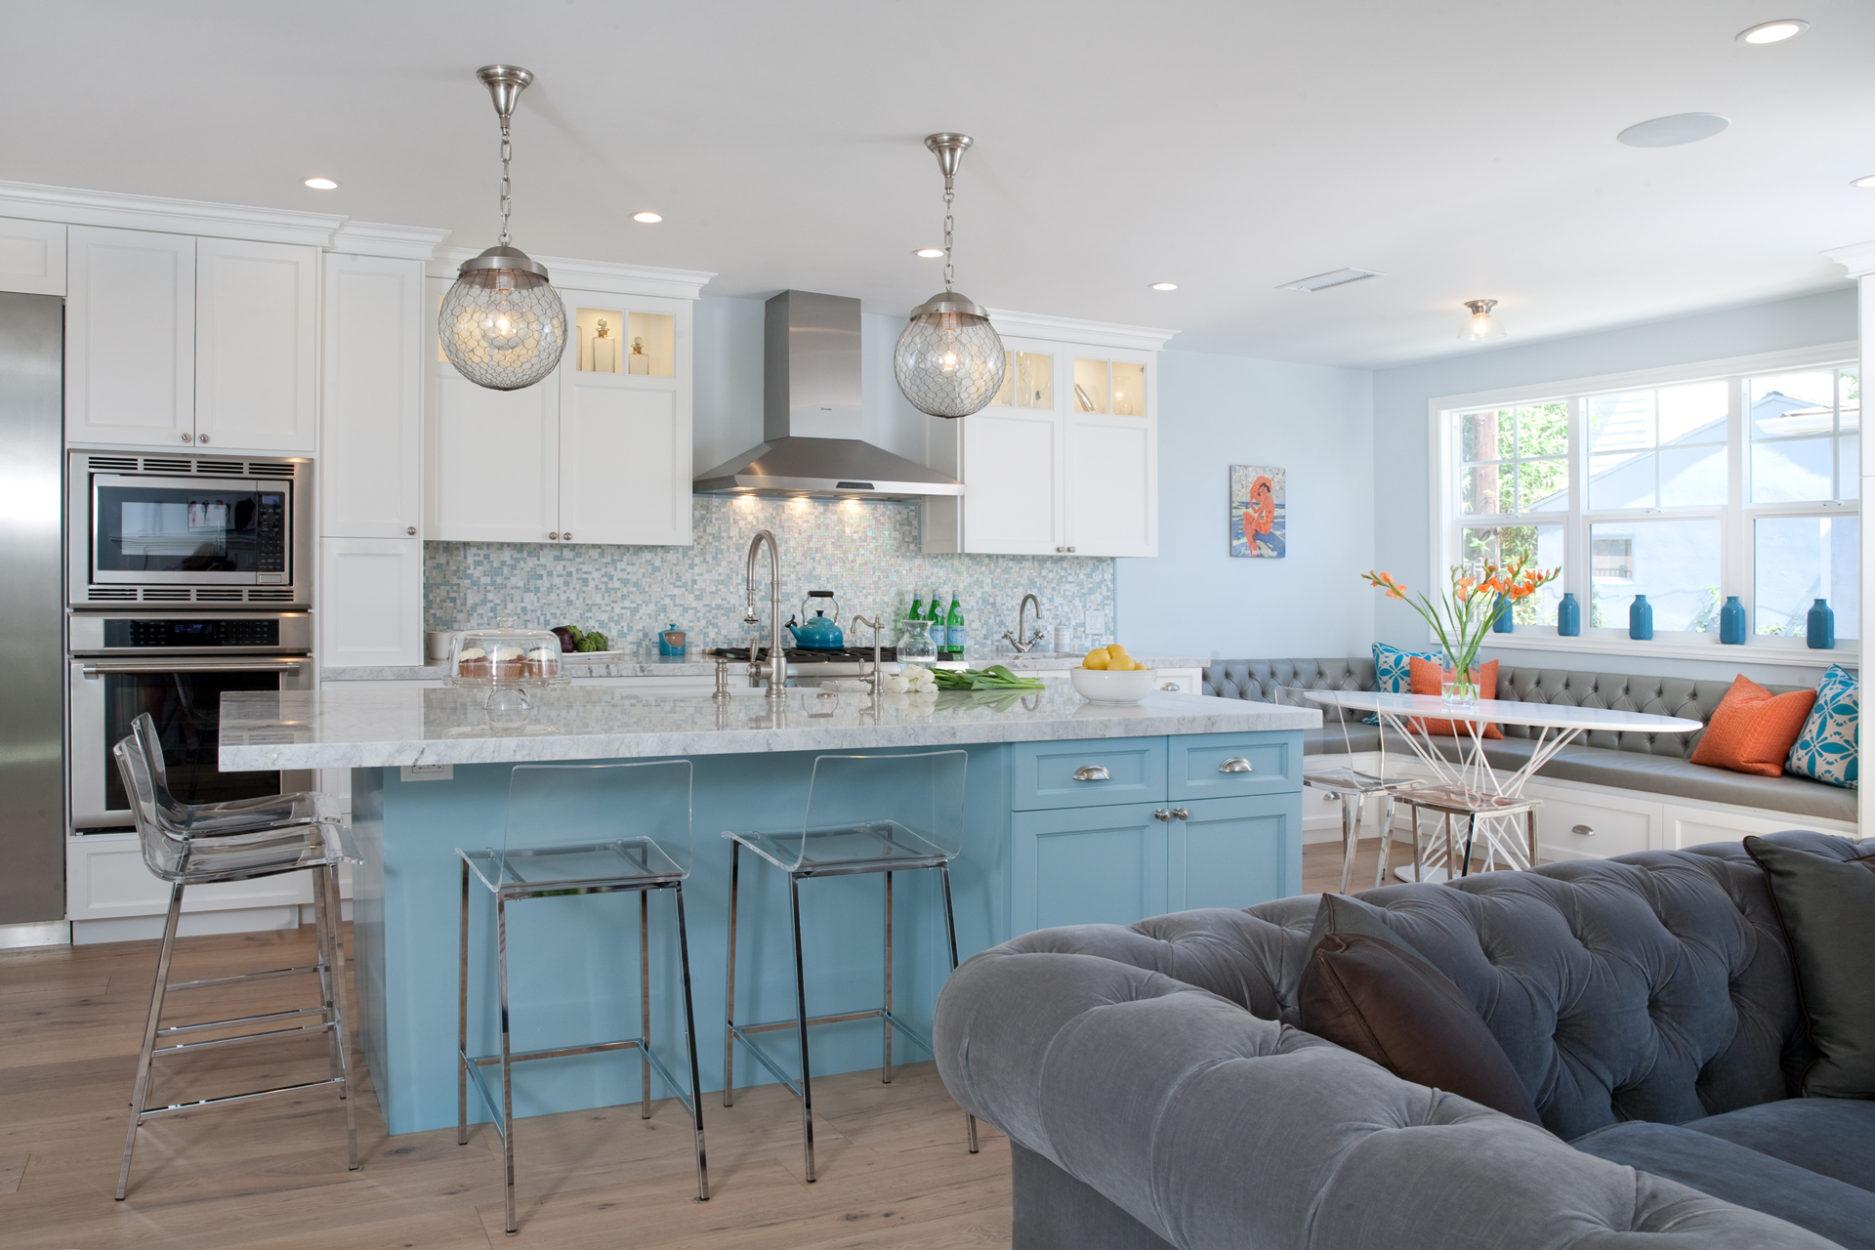 Small Kitchen Grey Cabinets Medallion